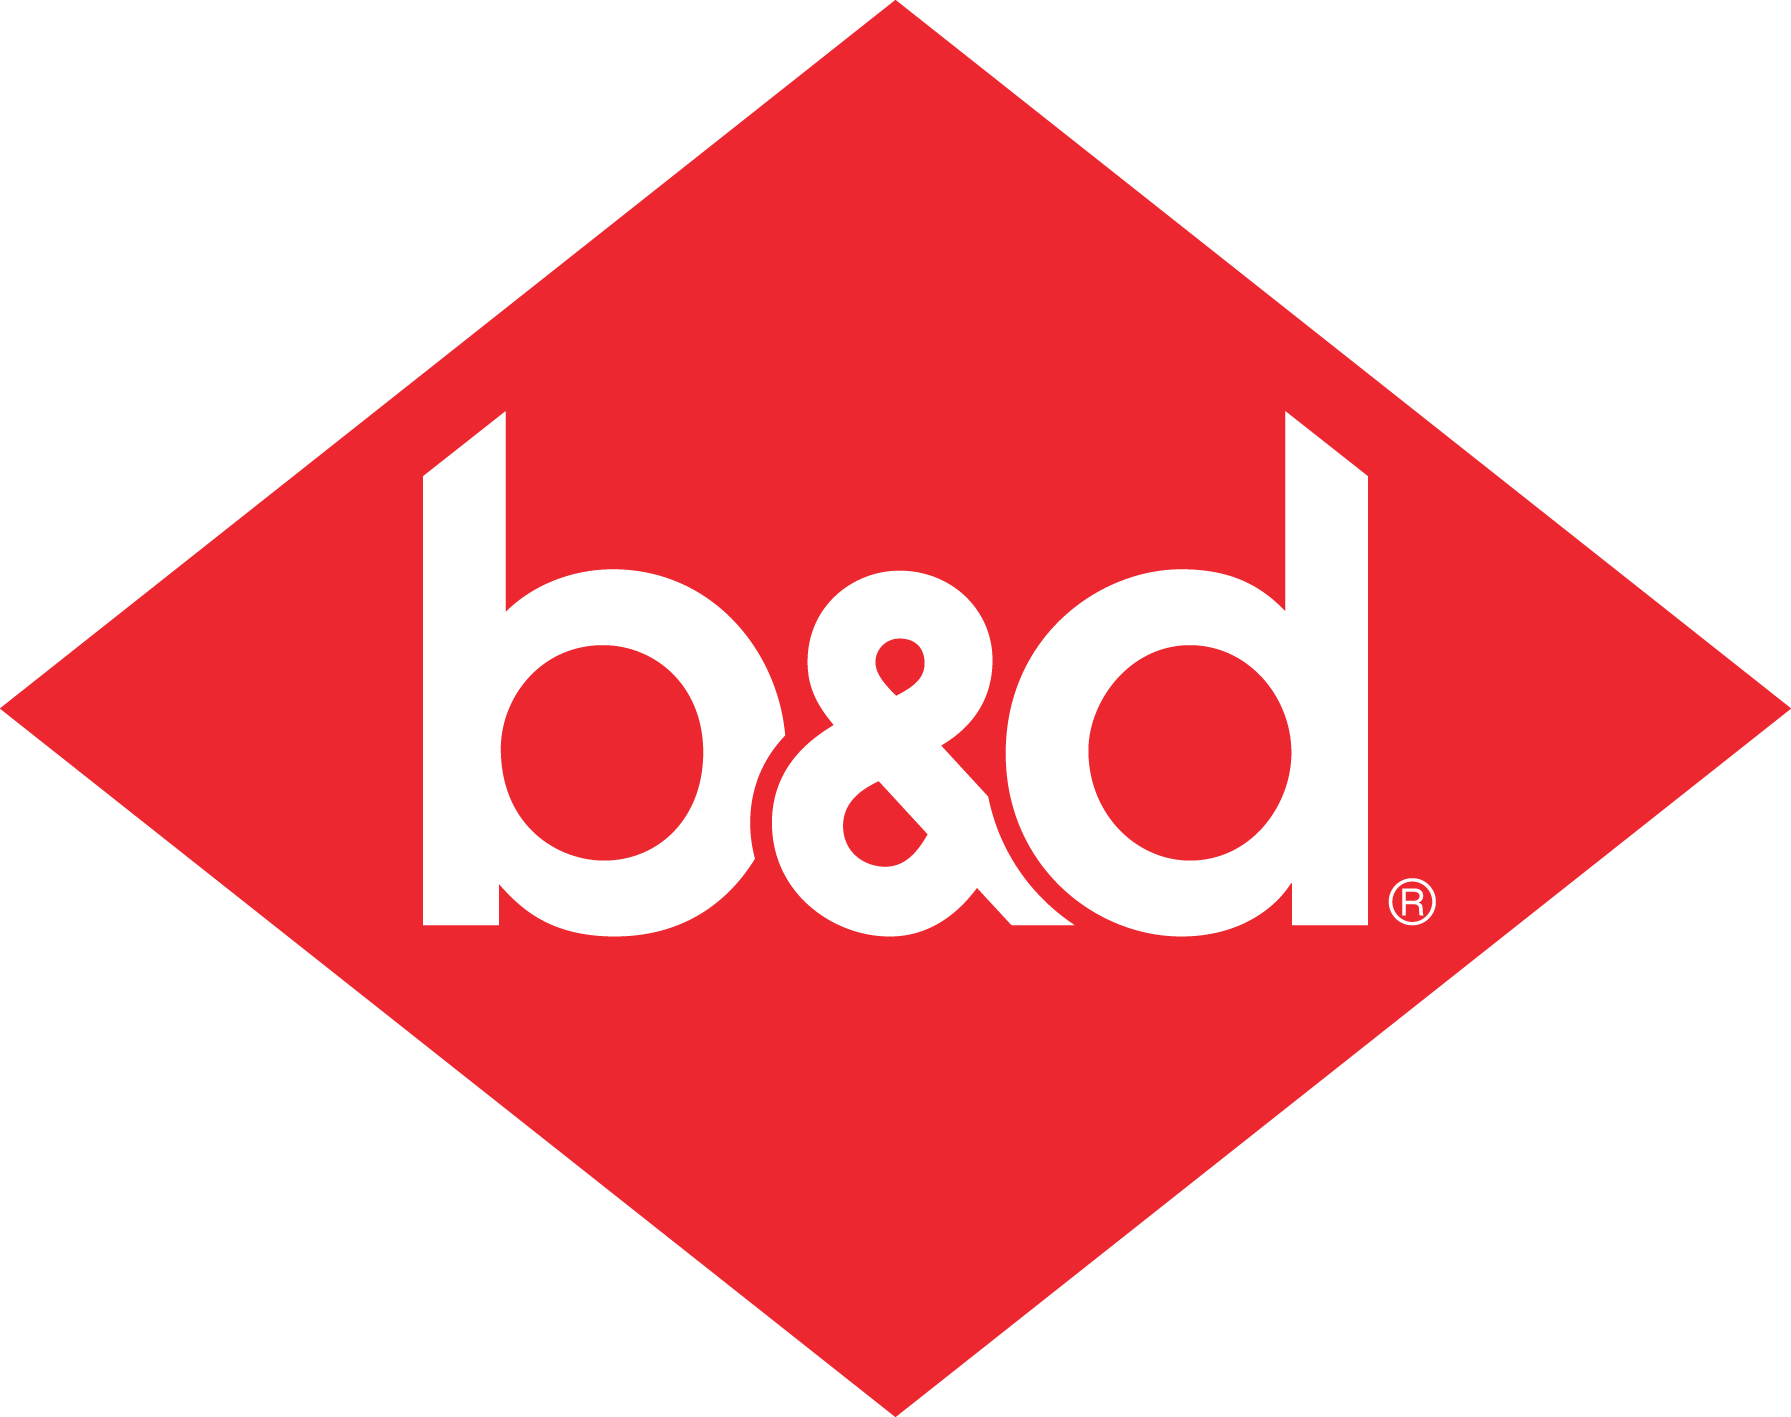 B&D Garage Doors and Garage Remotes